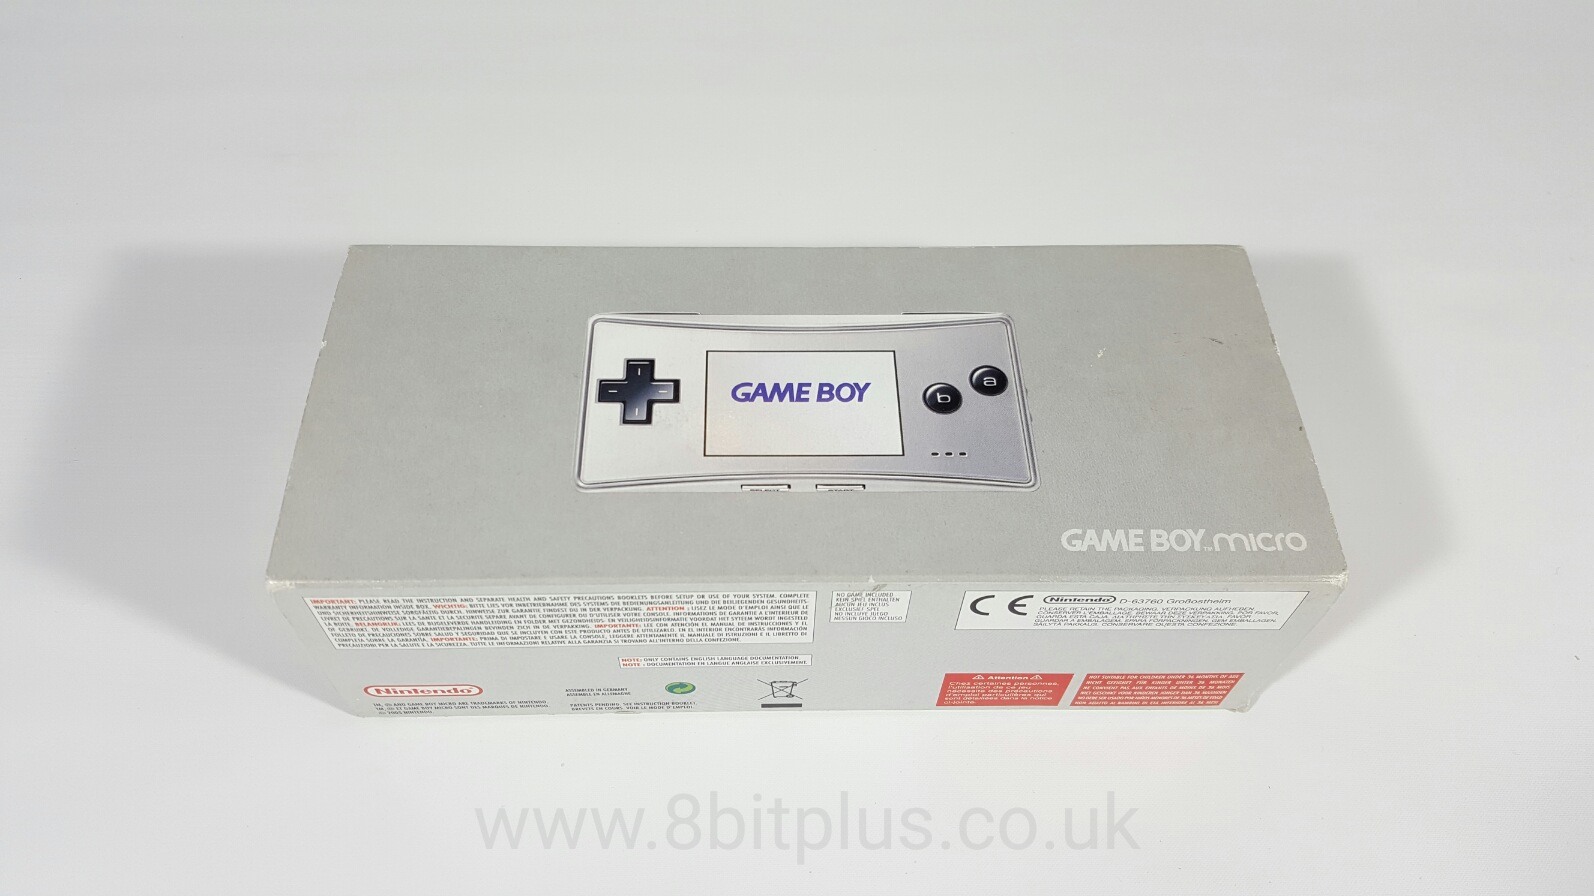 GameBoy_Micro_1